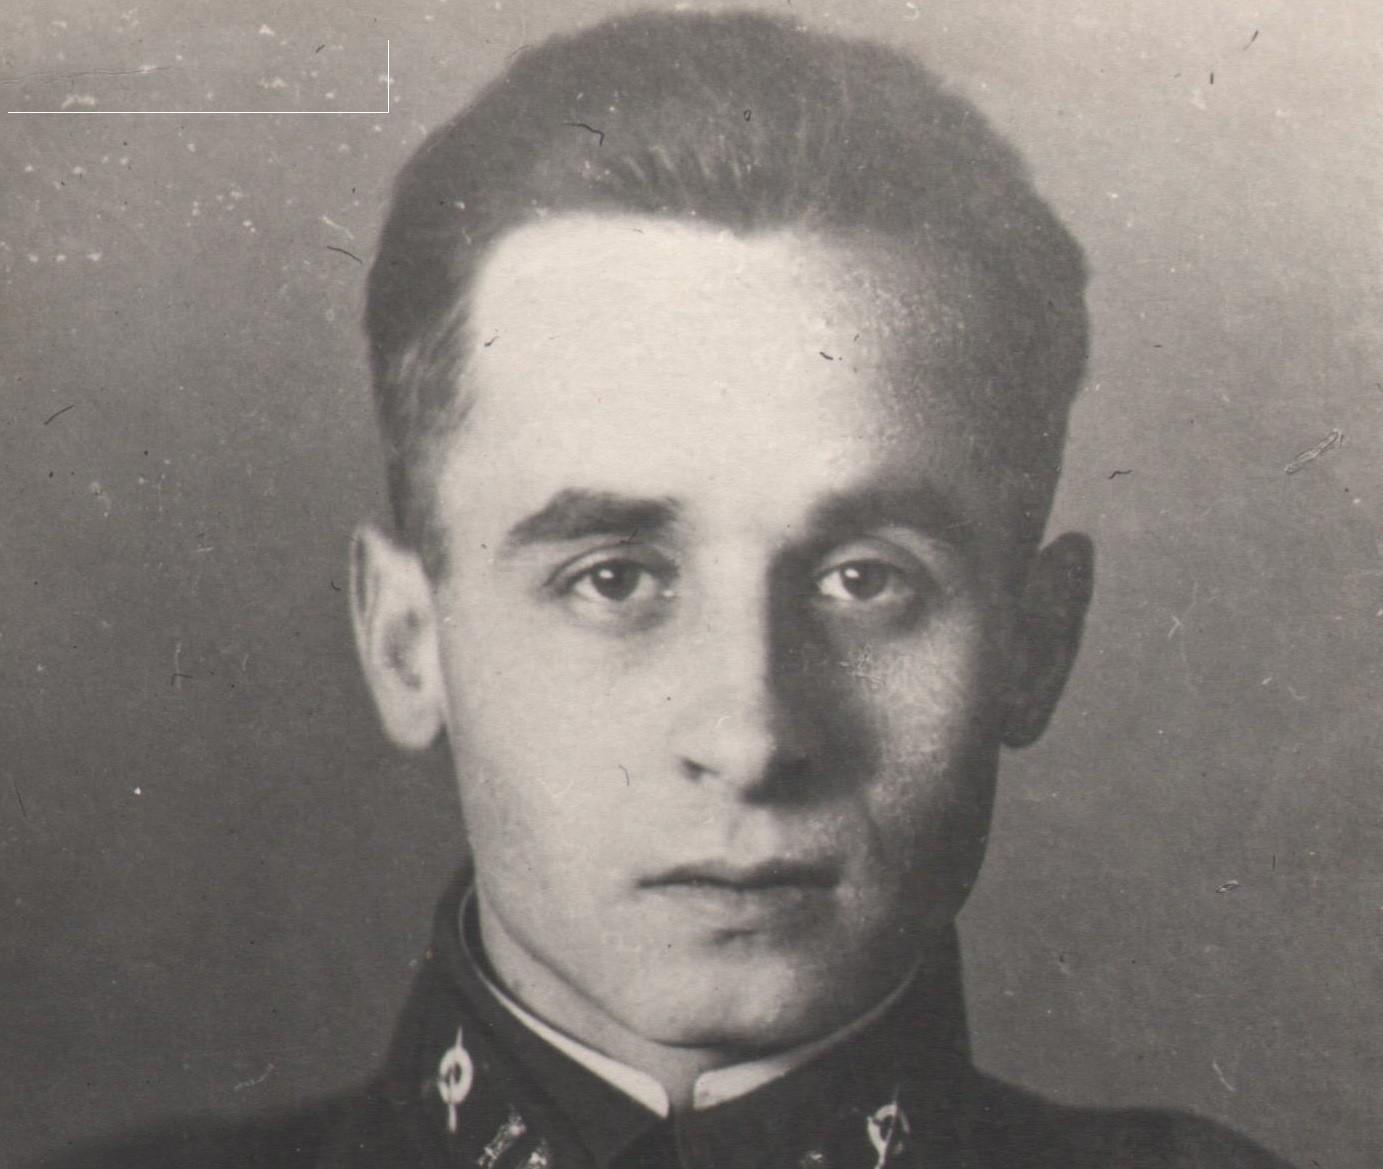 Седлецкий Феликс Антонович - копия